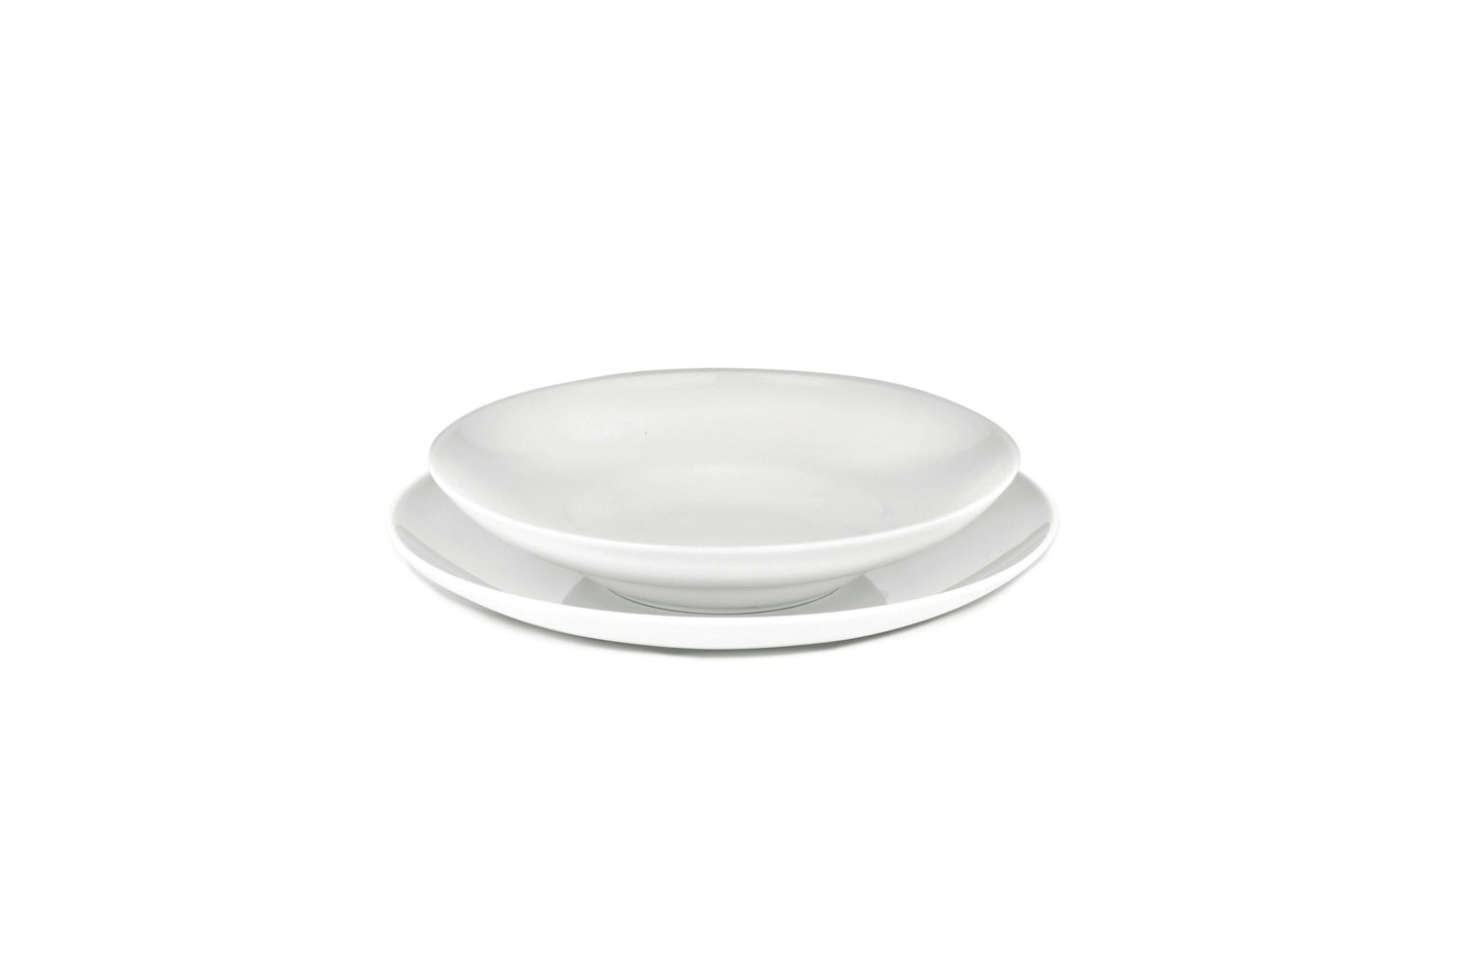 10 Easy Pieces: Architect-Designed Dinnerware